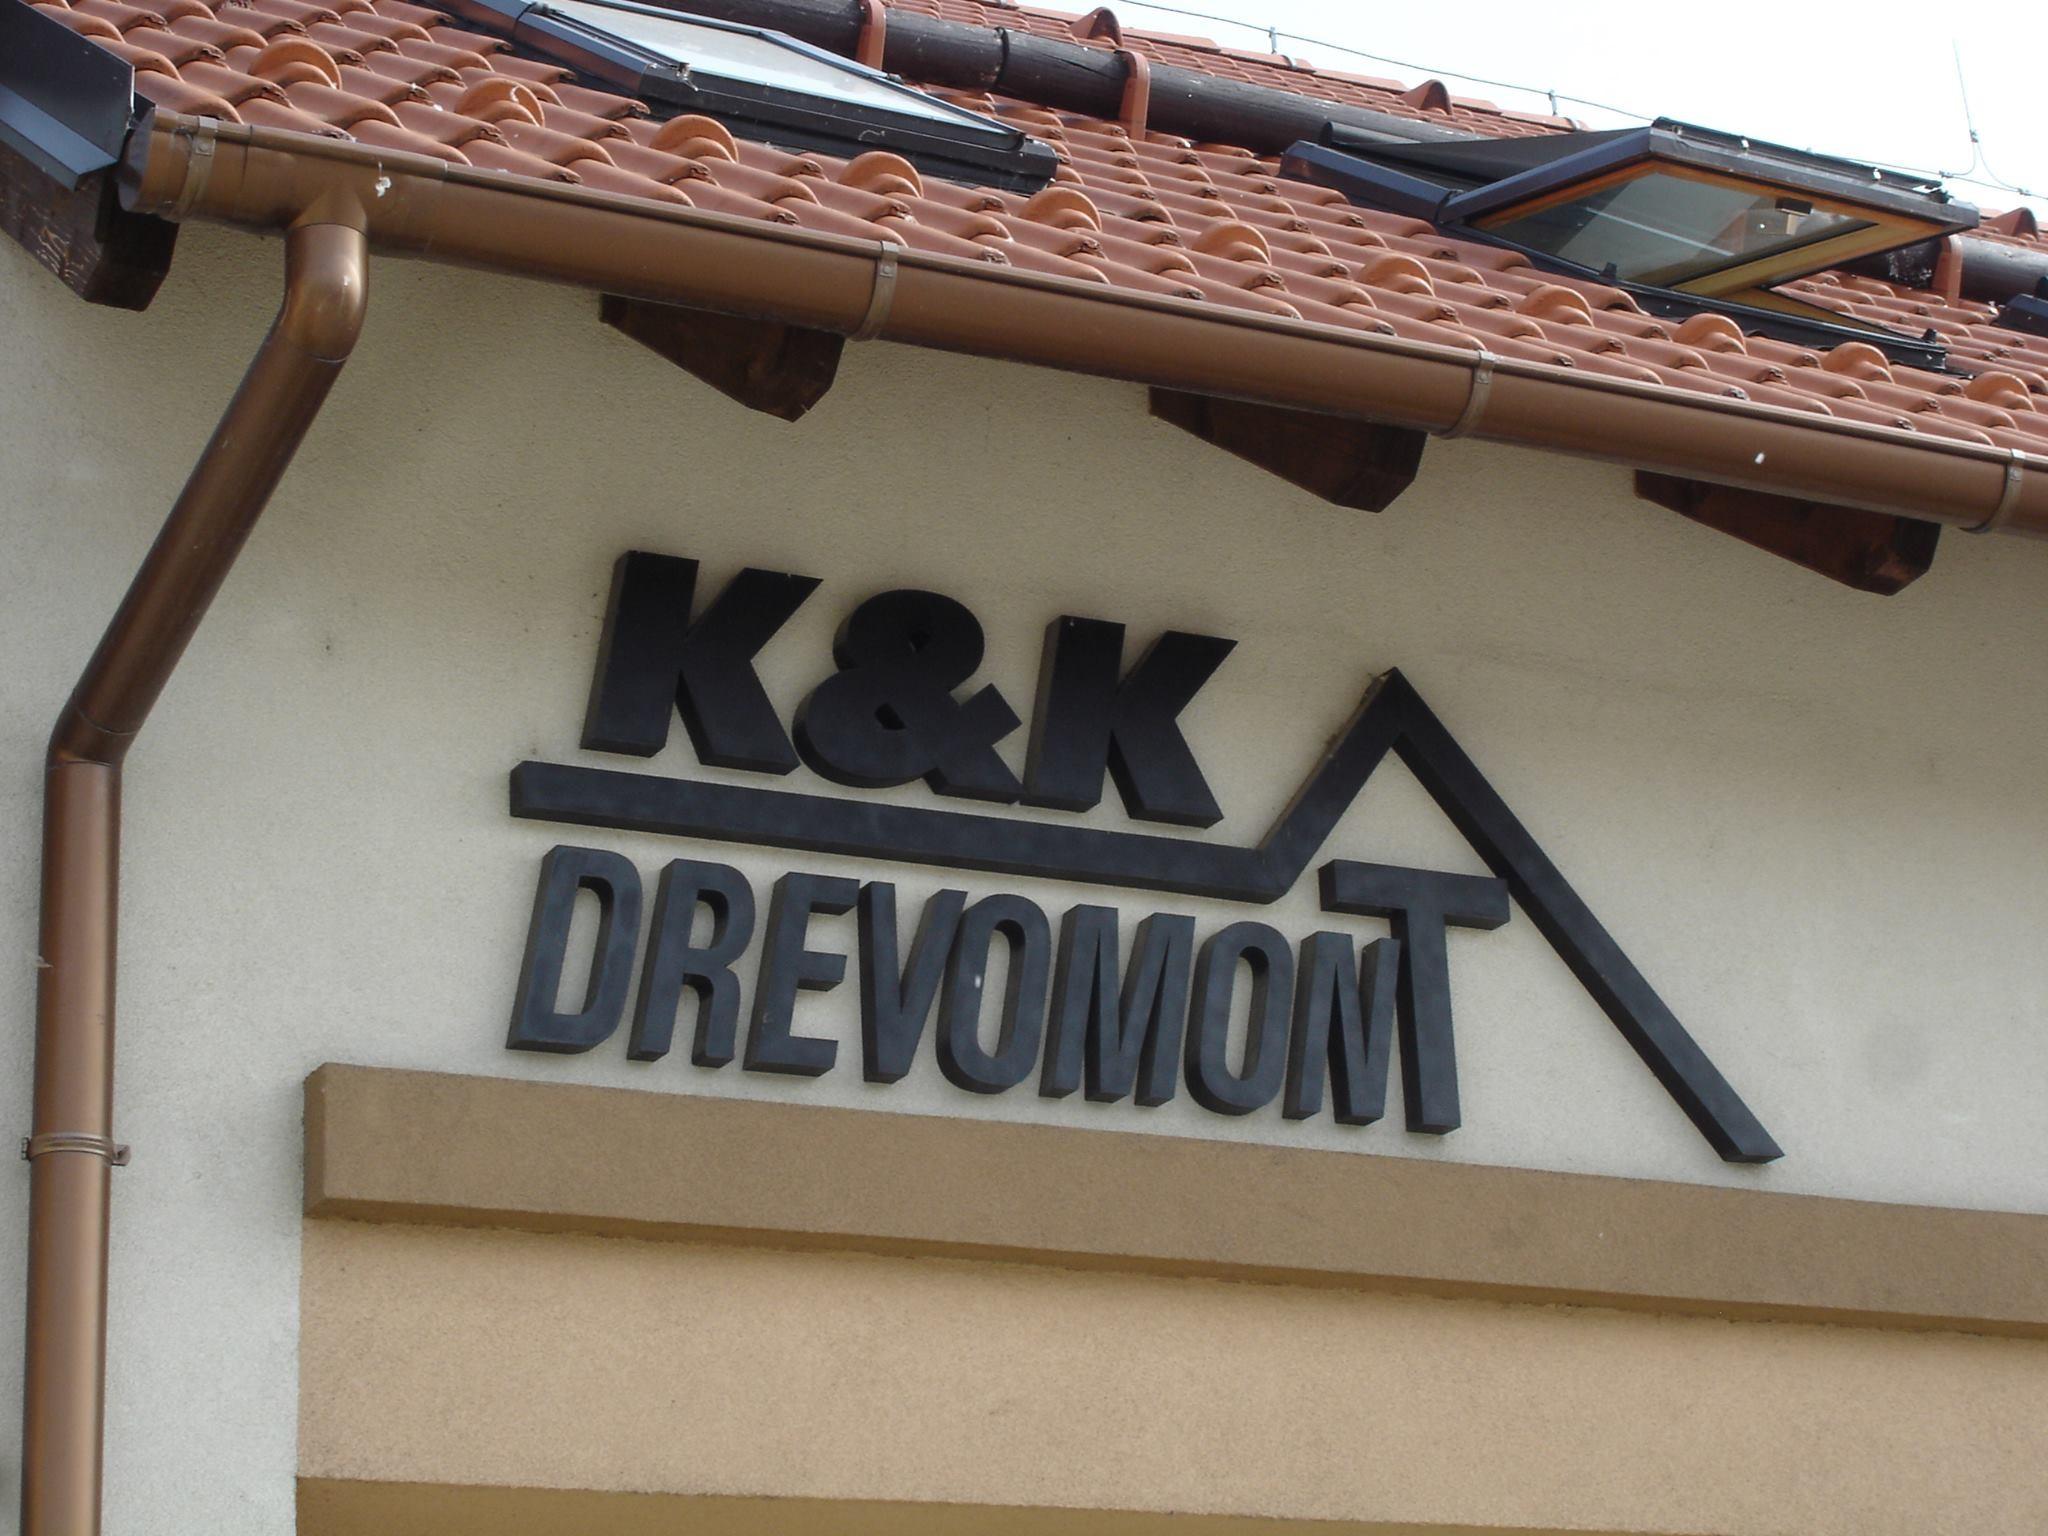 K & K Drevomont, s. r. o. logo